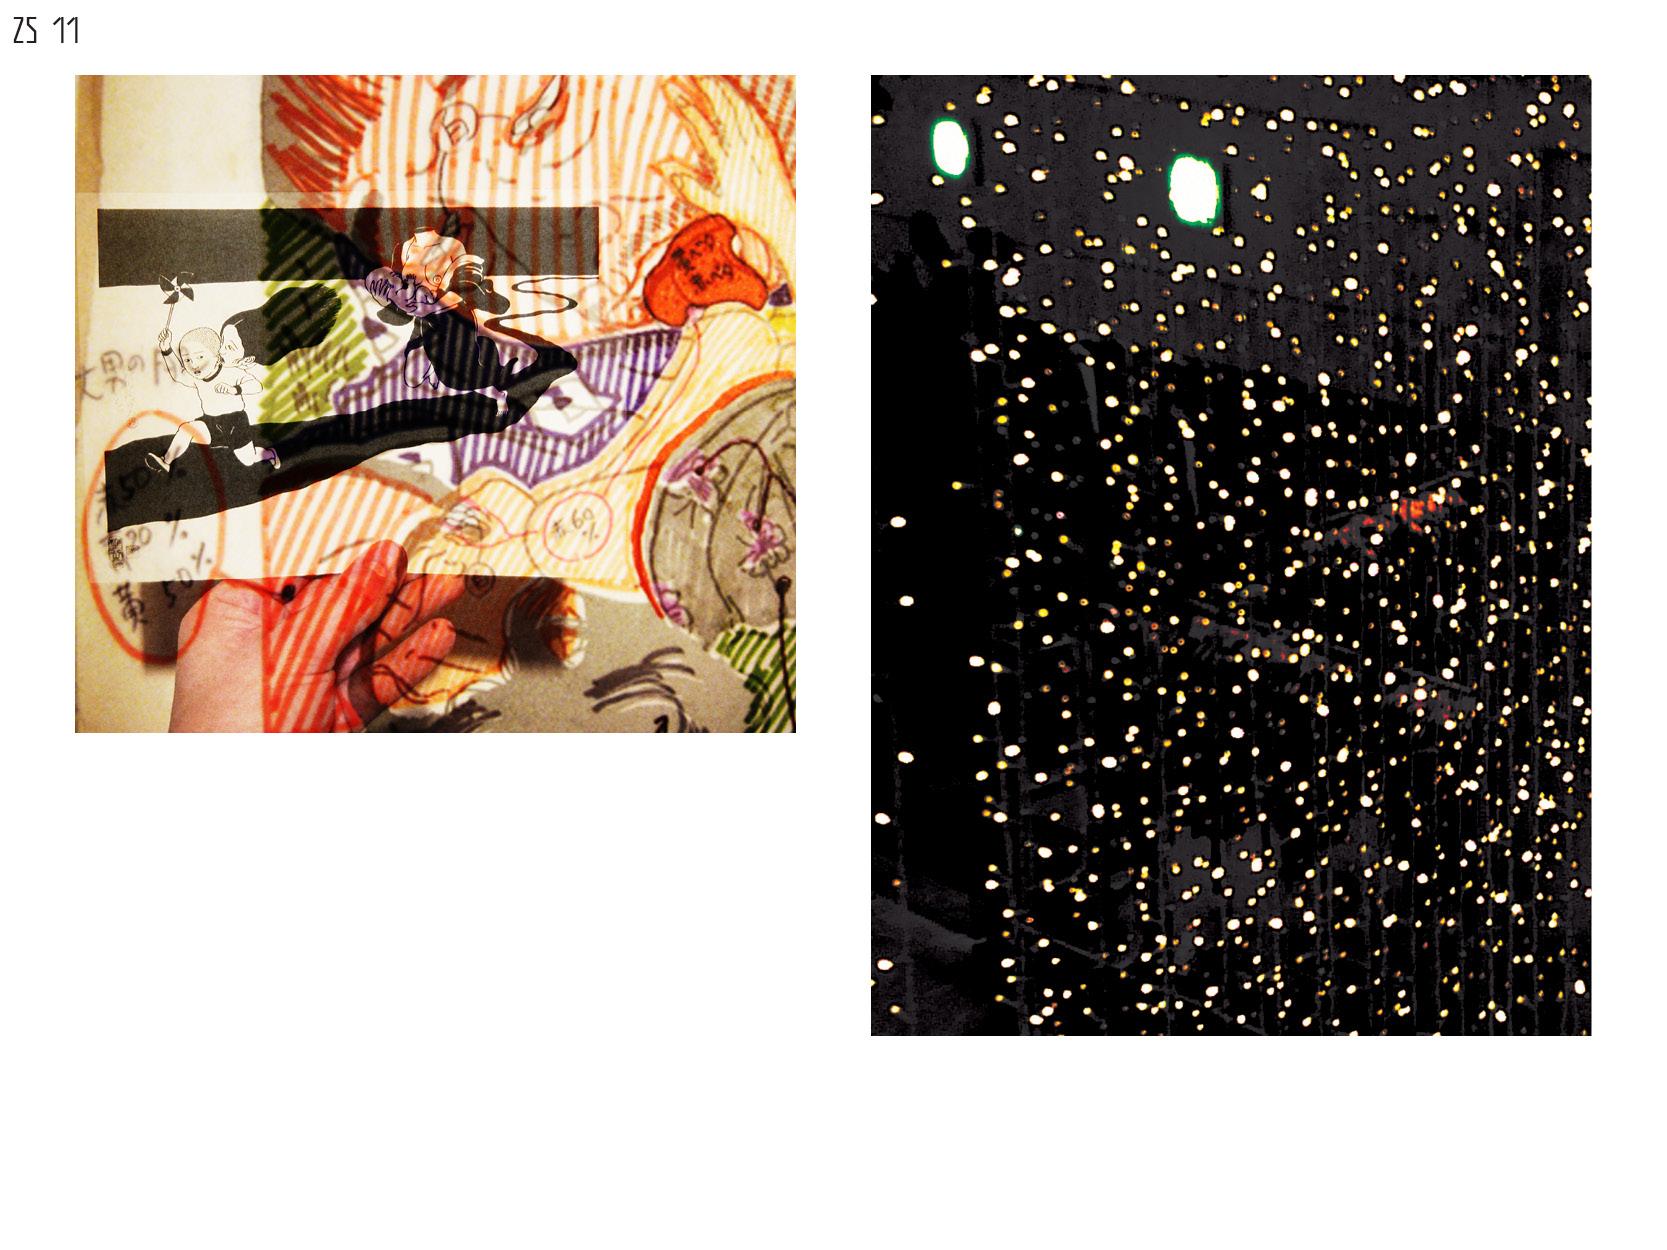 Gerrit-Schweiger-Dialog-Städte-Paris-Berlin-Jessica-Blank-Experiment-Fotoserie-Tagebuch-visuelle-Kommunikation-40